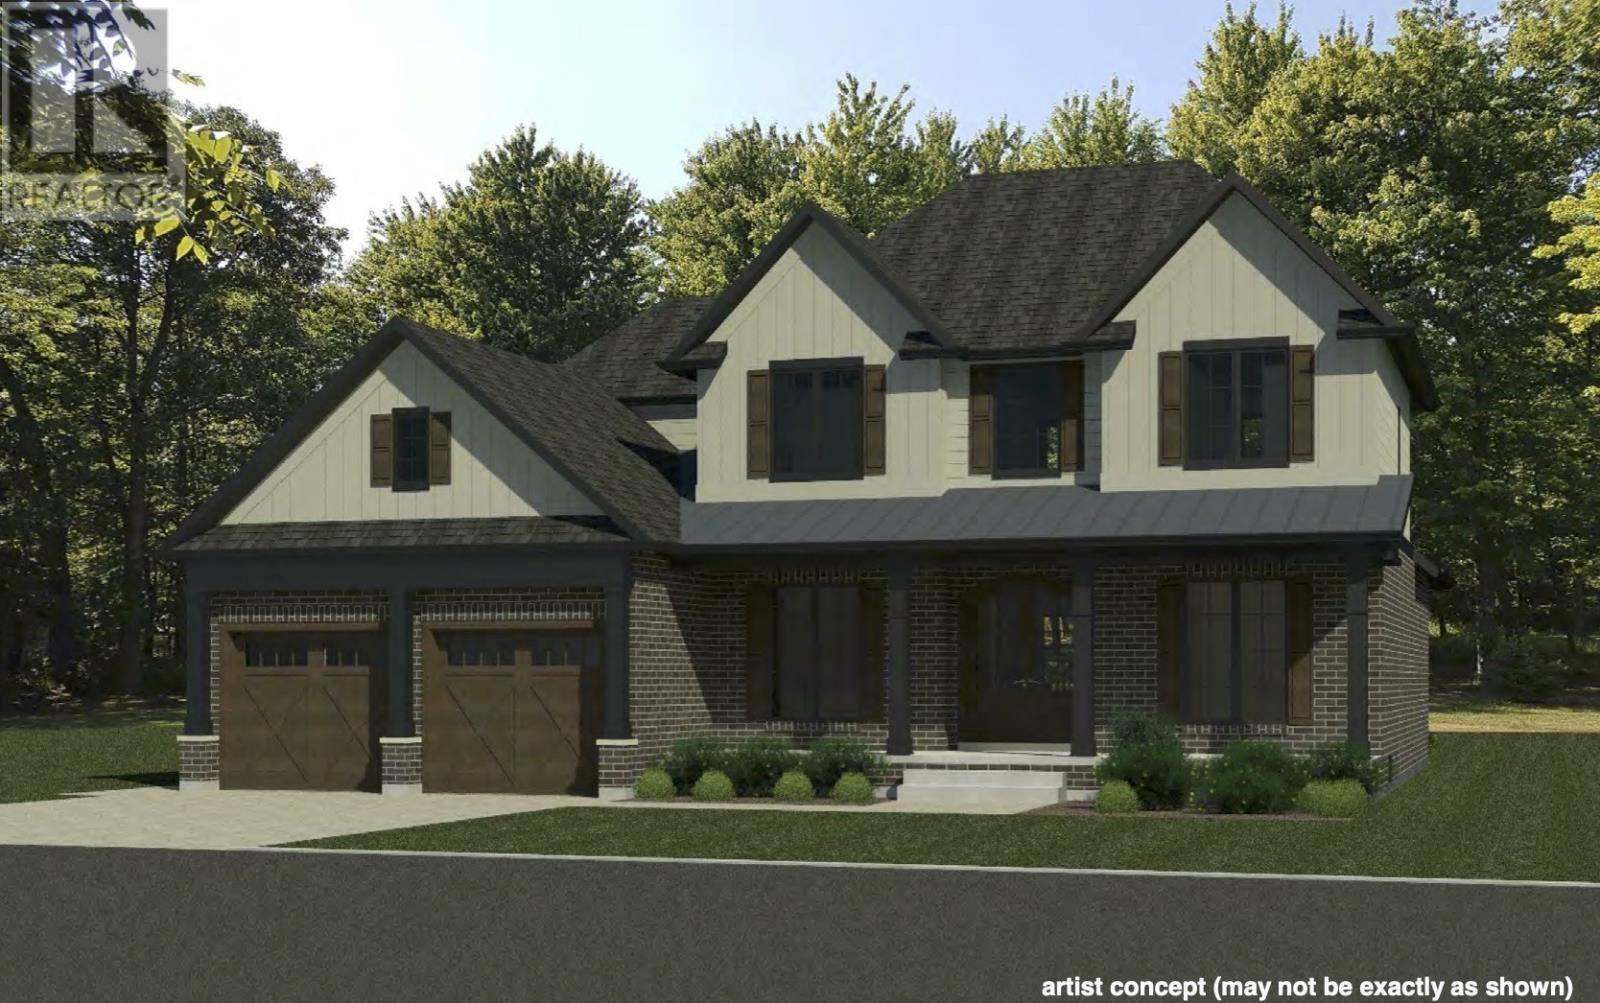 House for sale at 639 Kenwood Blvd Lasalle Ontario - MLS: 19029061